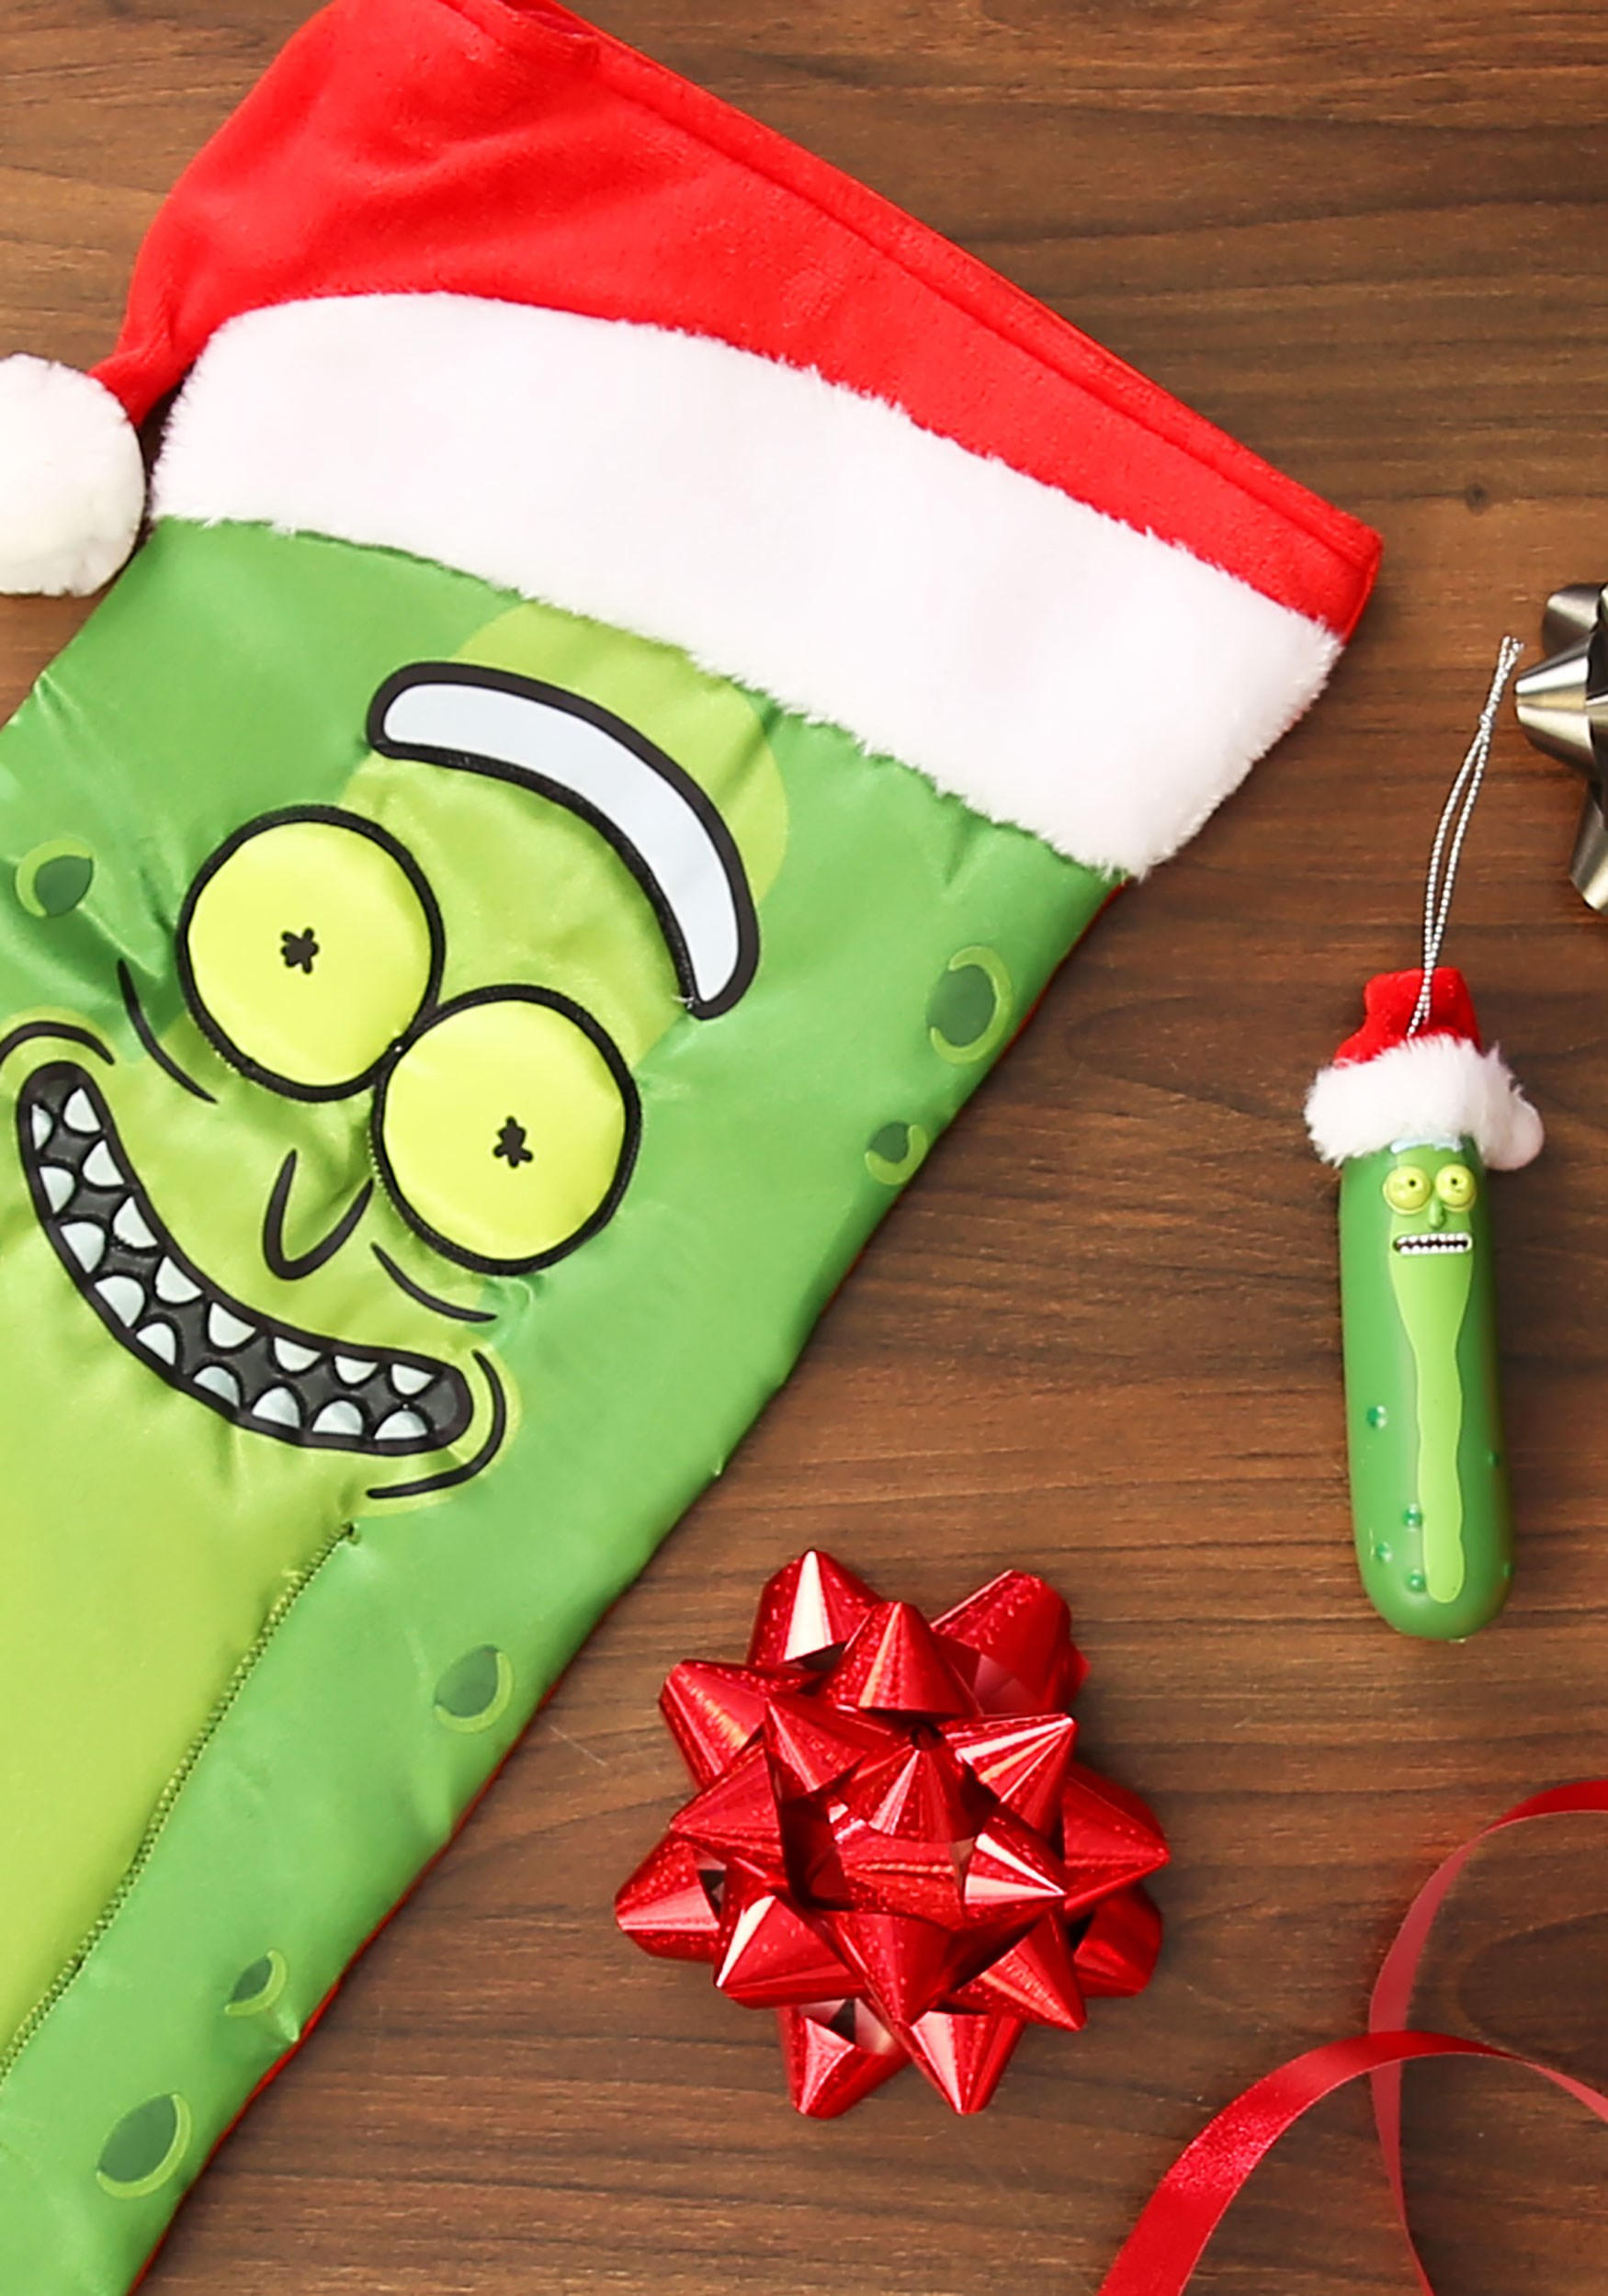 Kurt S Adler Rick /& Morty Pickle Rick Santa with Hat Christmas Holiday Ornament